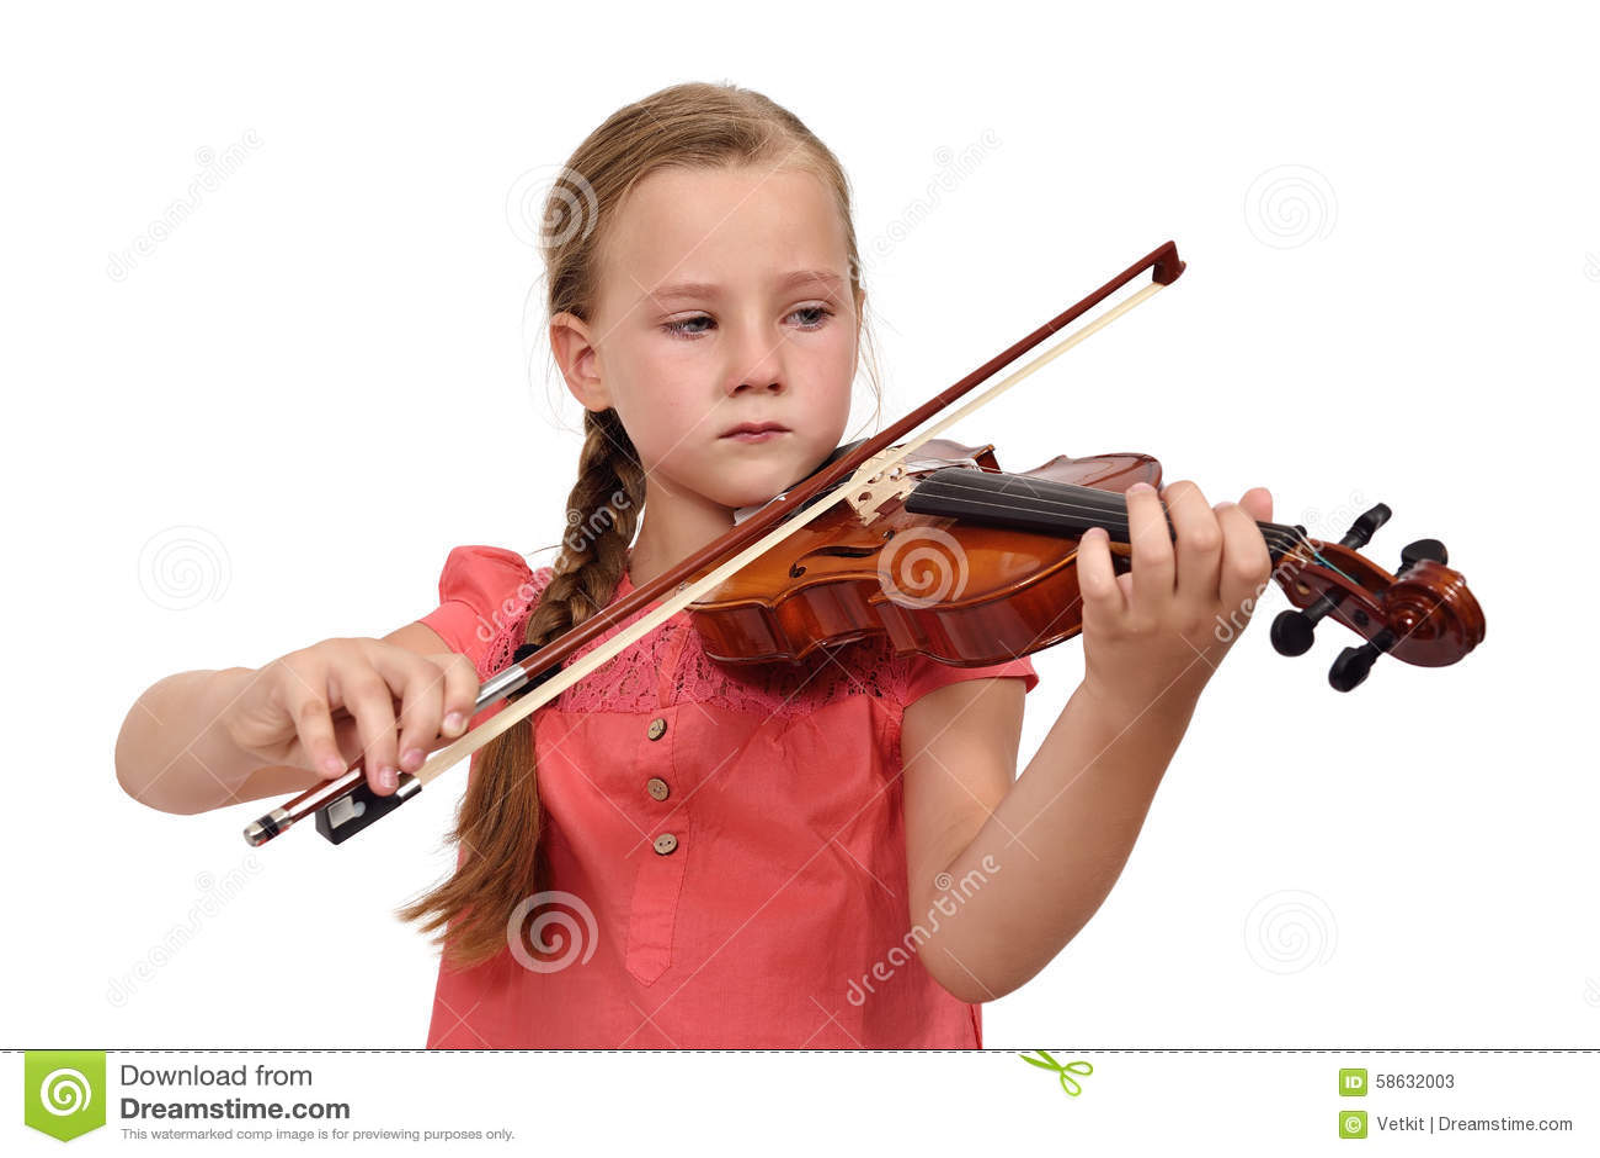 Sad Girl With A Violin Stock Photo - Image: 58632003